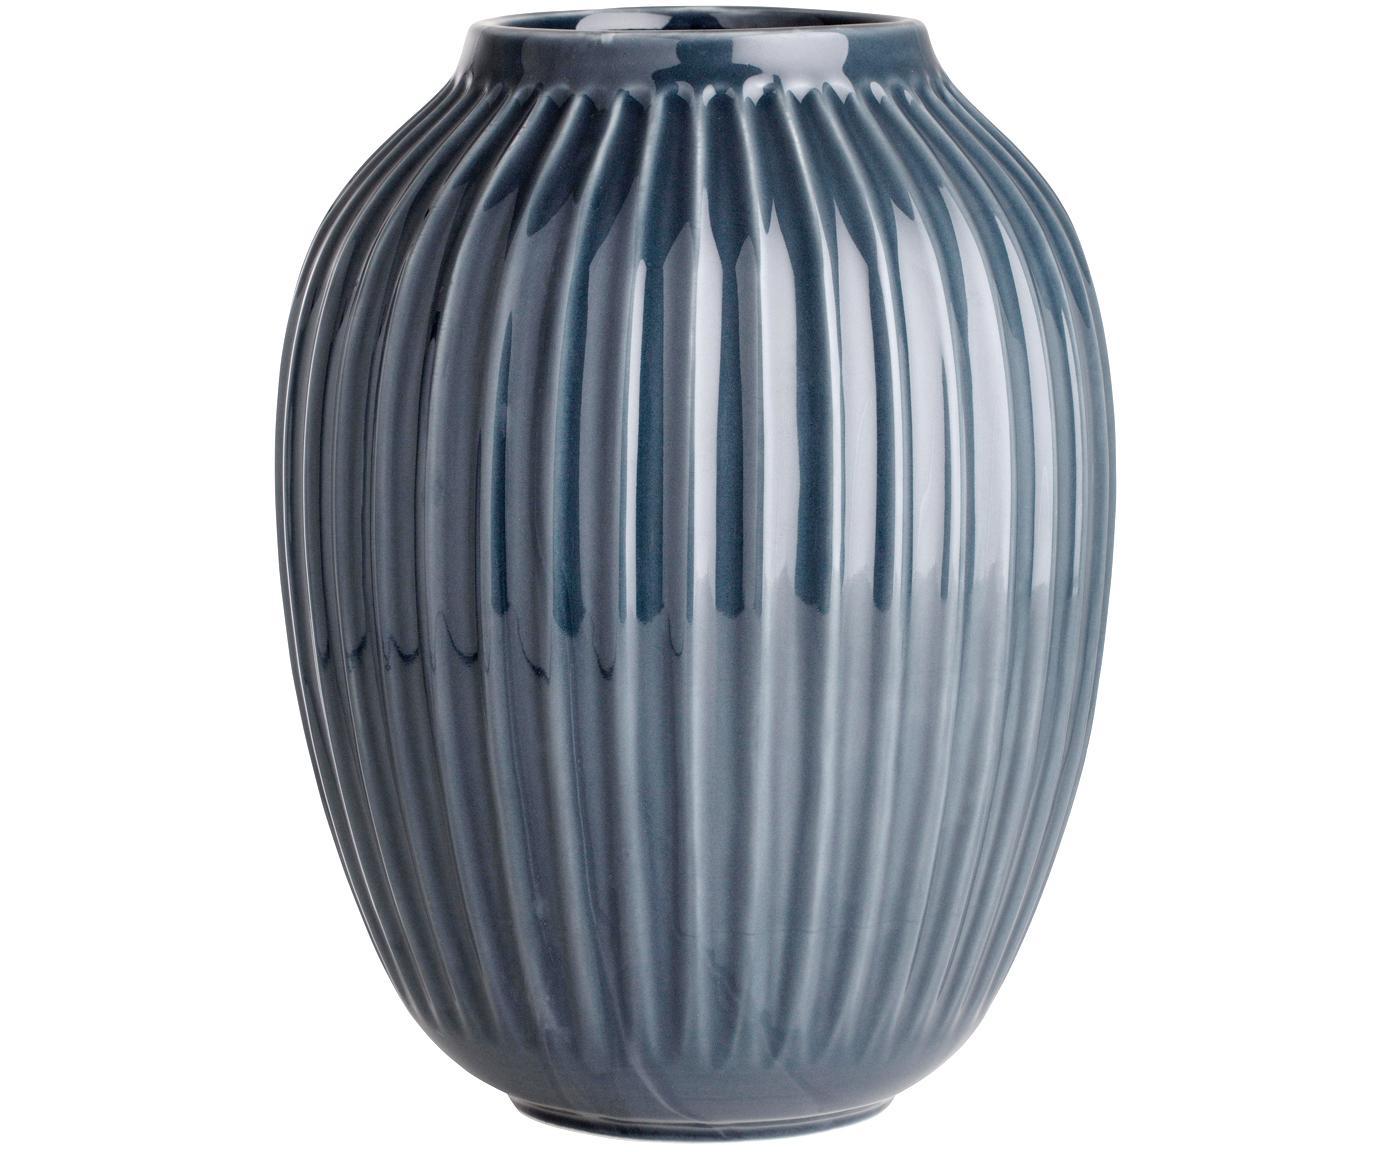 Jarrón artesanal de diseño Hammershøi, Porcelana, Gris antracita, Ø 20 x Al 25 cm